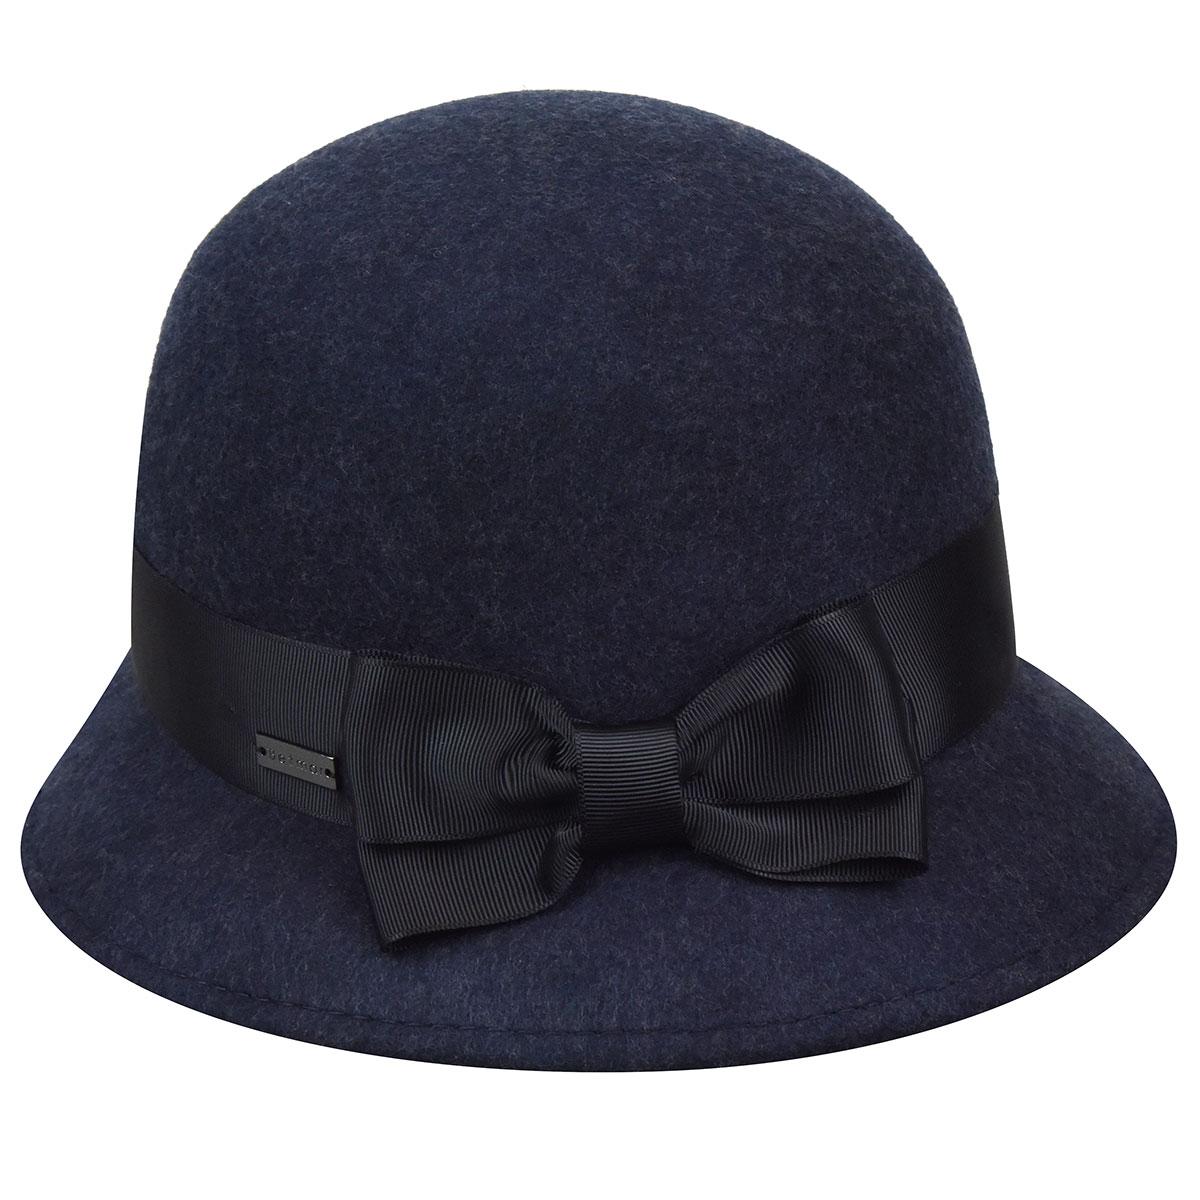 1920s Style Hats Emma Cloche $54.00 AT vintagedancer.com